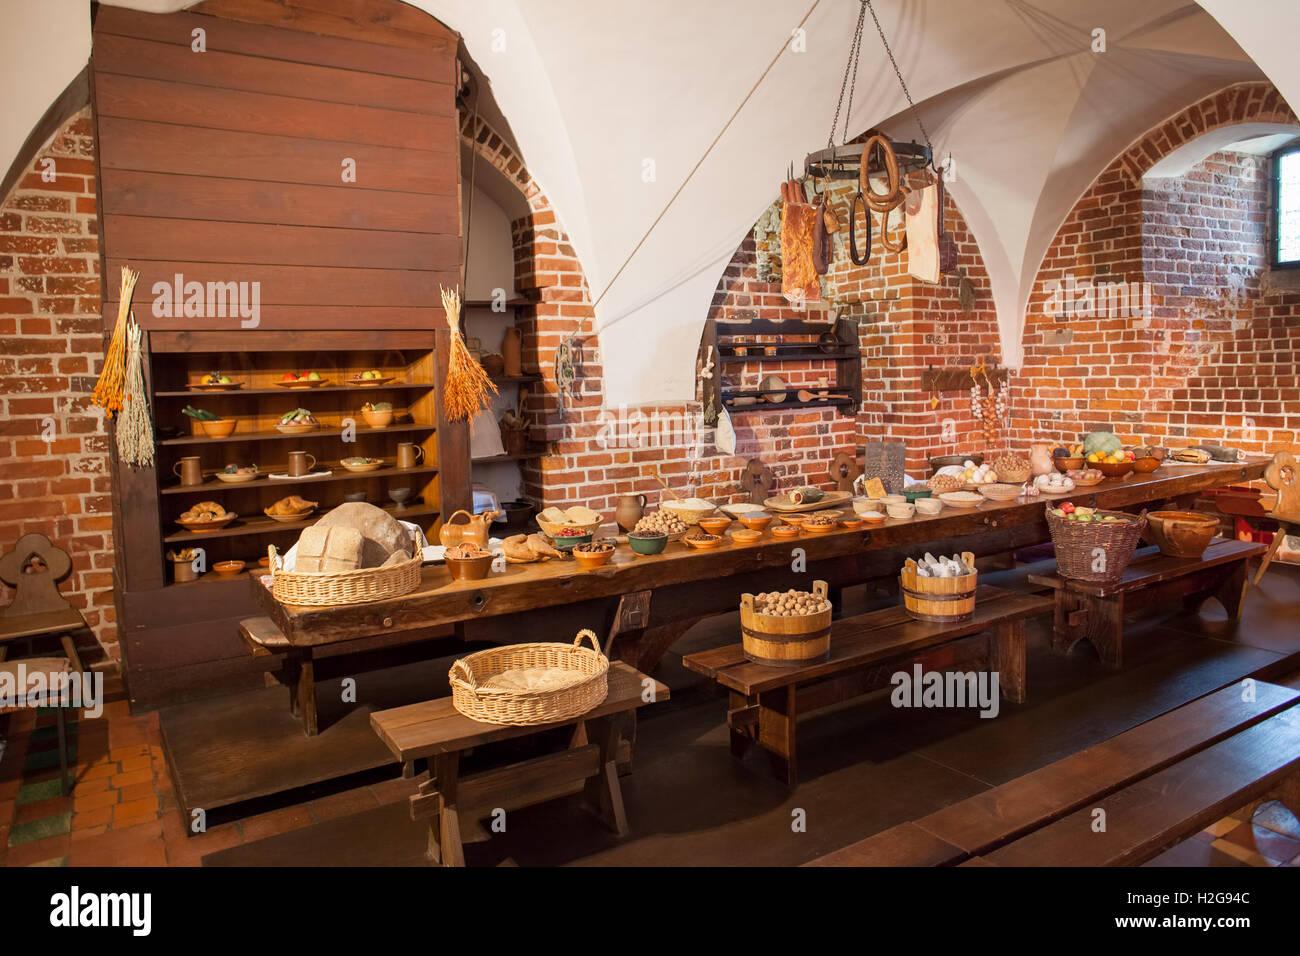 poland, malbork castle interior, feast at medieval convent kitchen